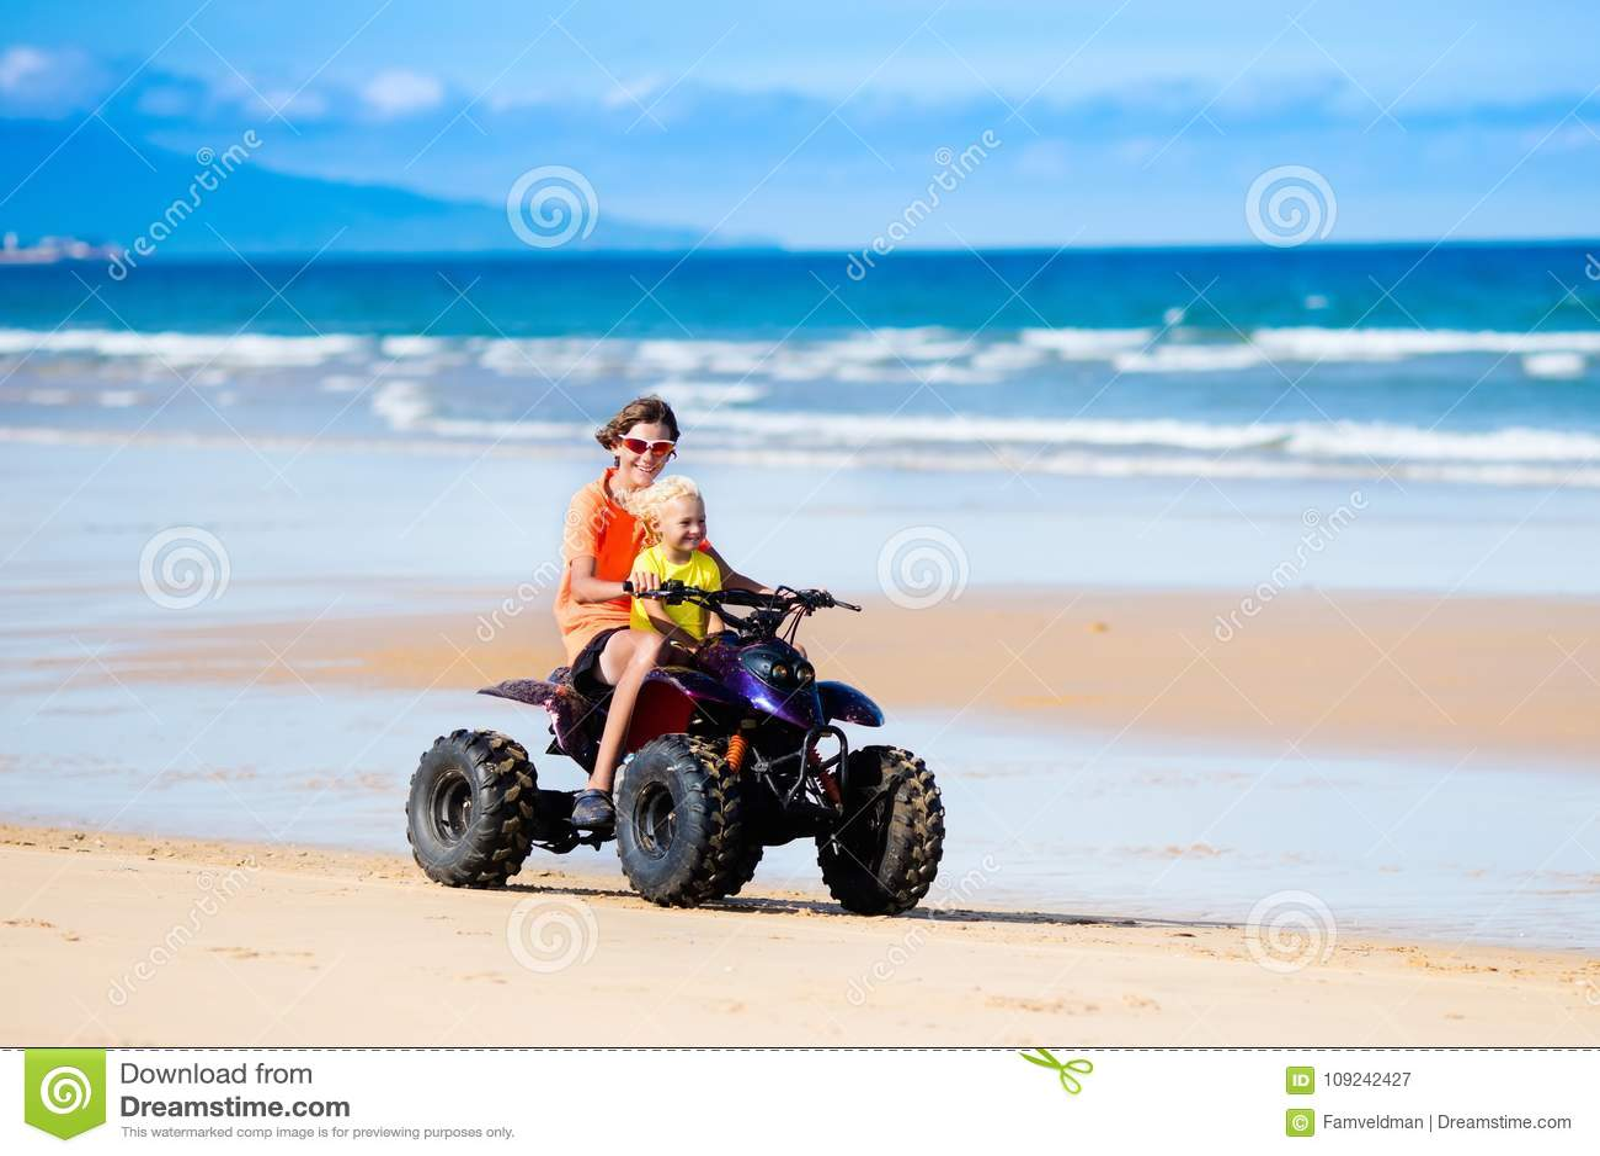 Kids On Quad Bike  Off Road All Terrain Vehicle  Stock Image